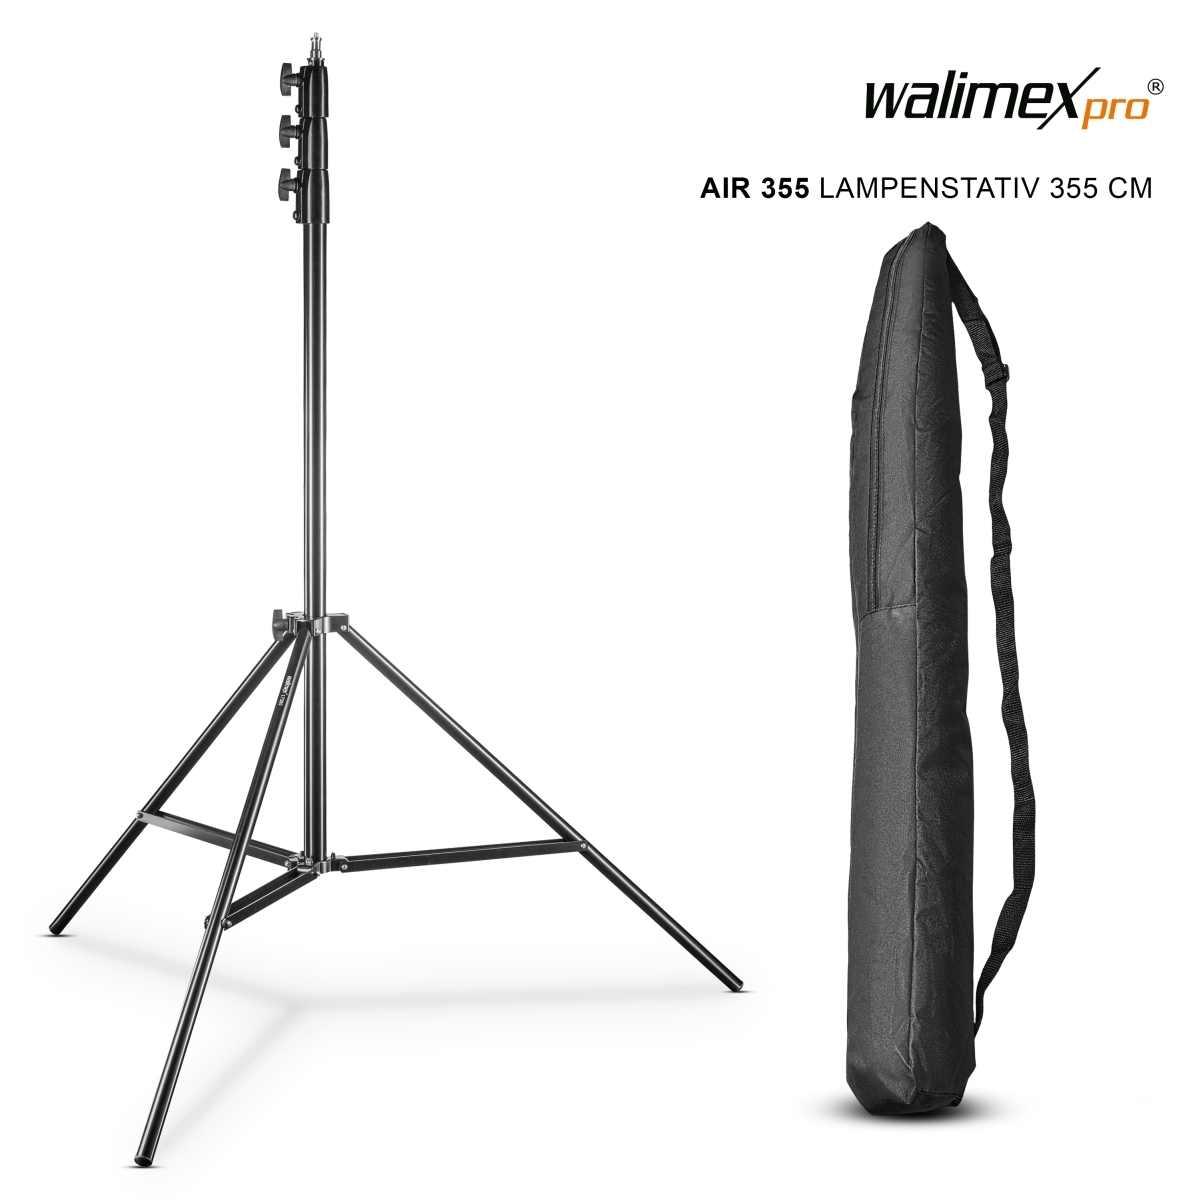 Walimex pro Lamp Tripod AIR, 355cm